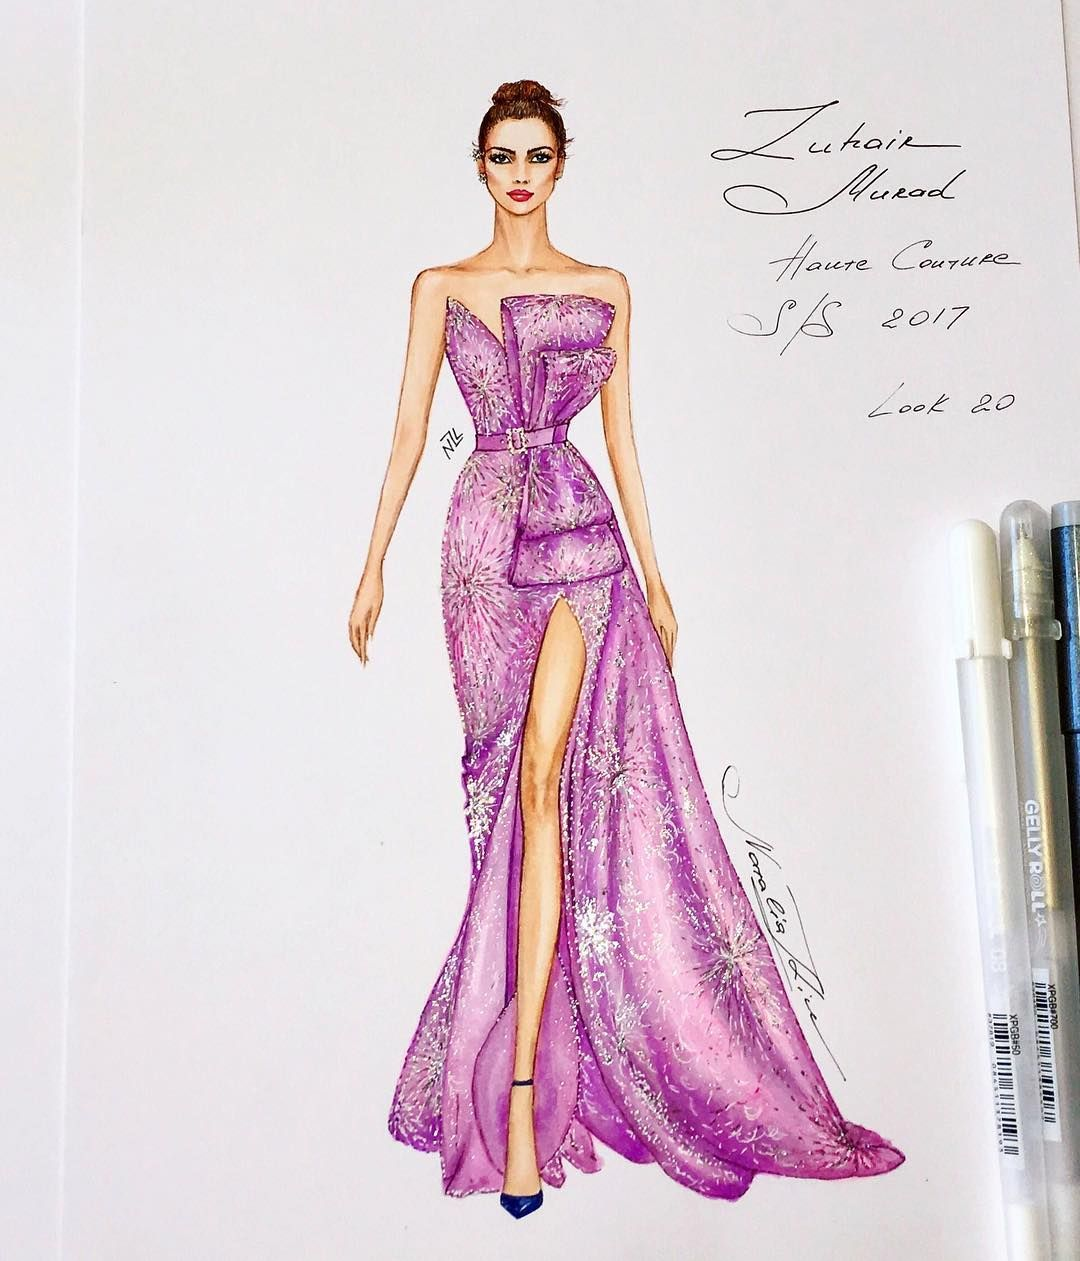 856 Likes 6 Comments Nataliaz Liu Nataliazorinliu On Instagram Fashion Illustration Dresses Fashion Illustration Sketches Dresses Fashion Design Sketches